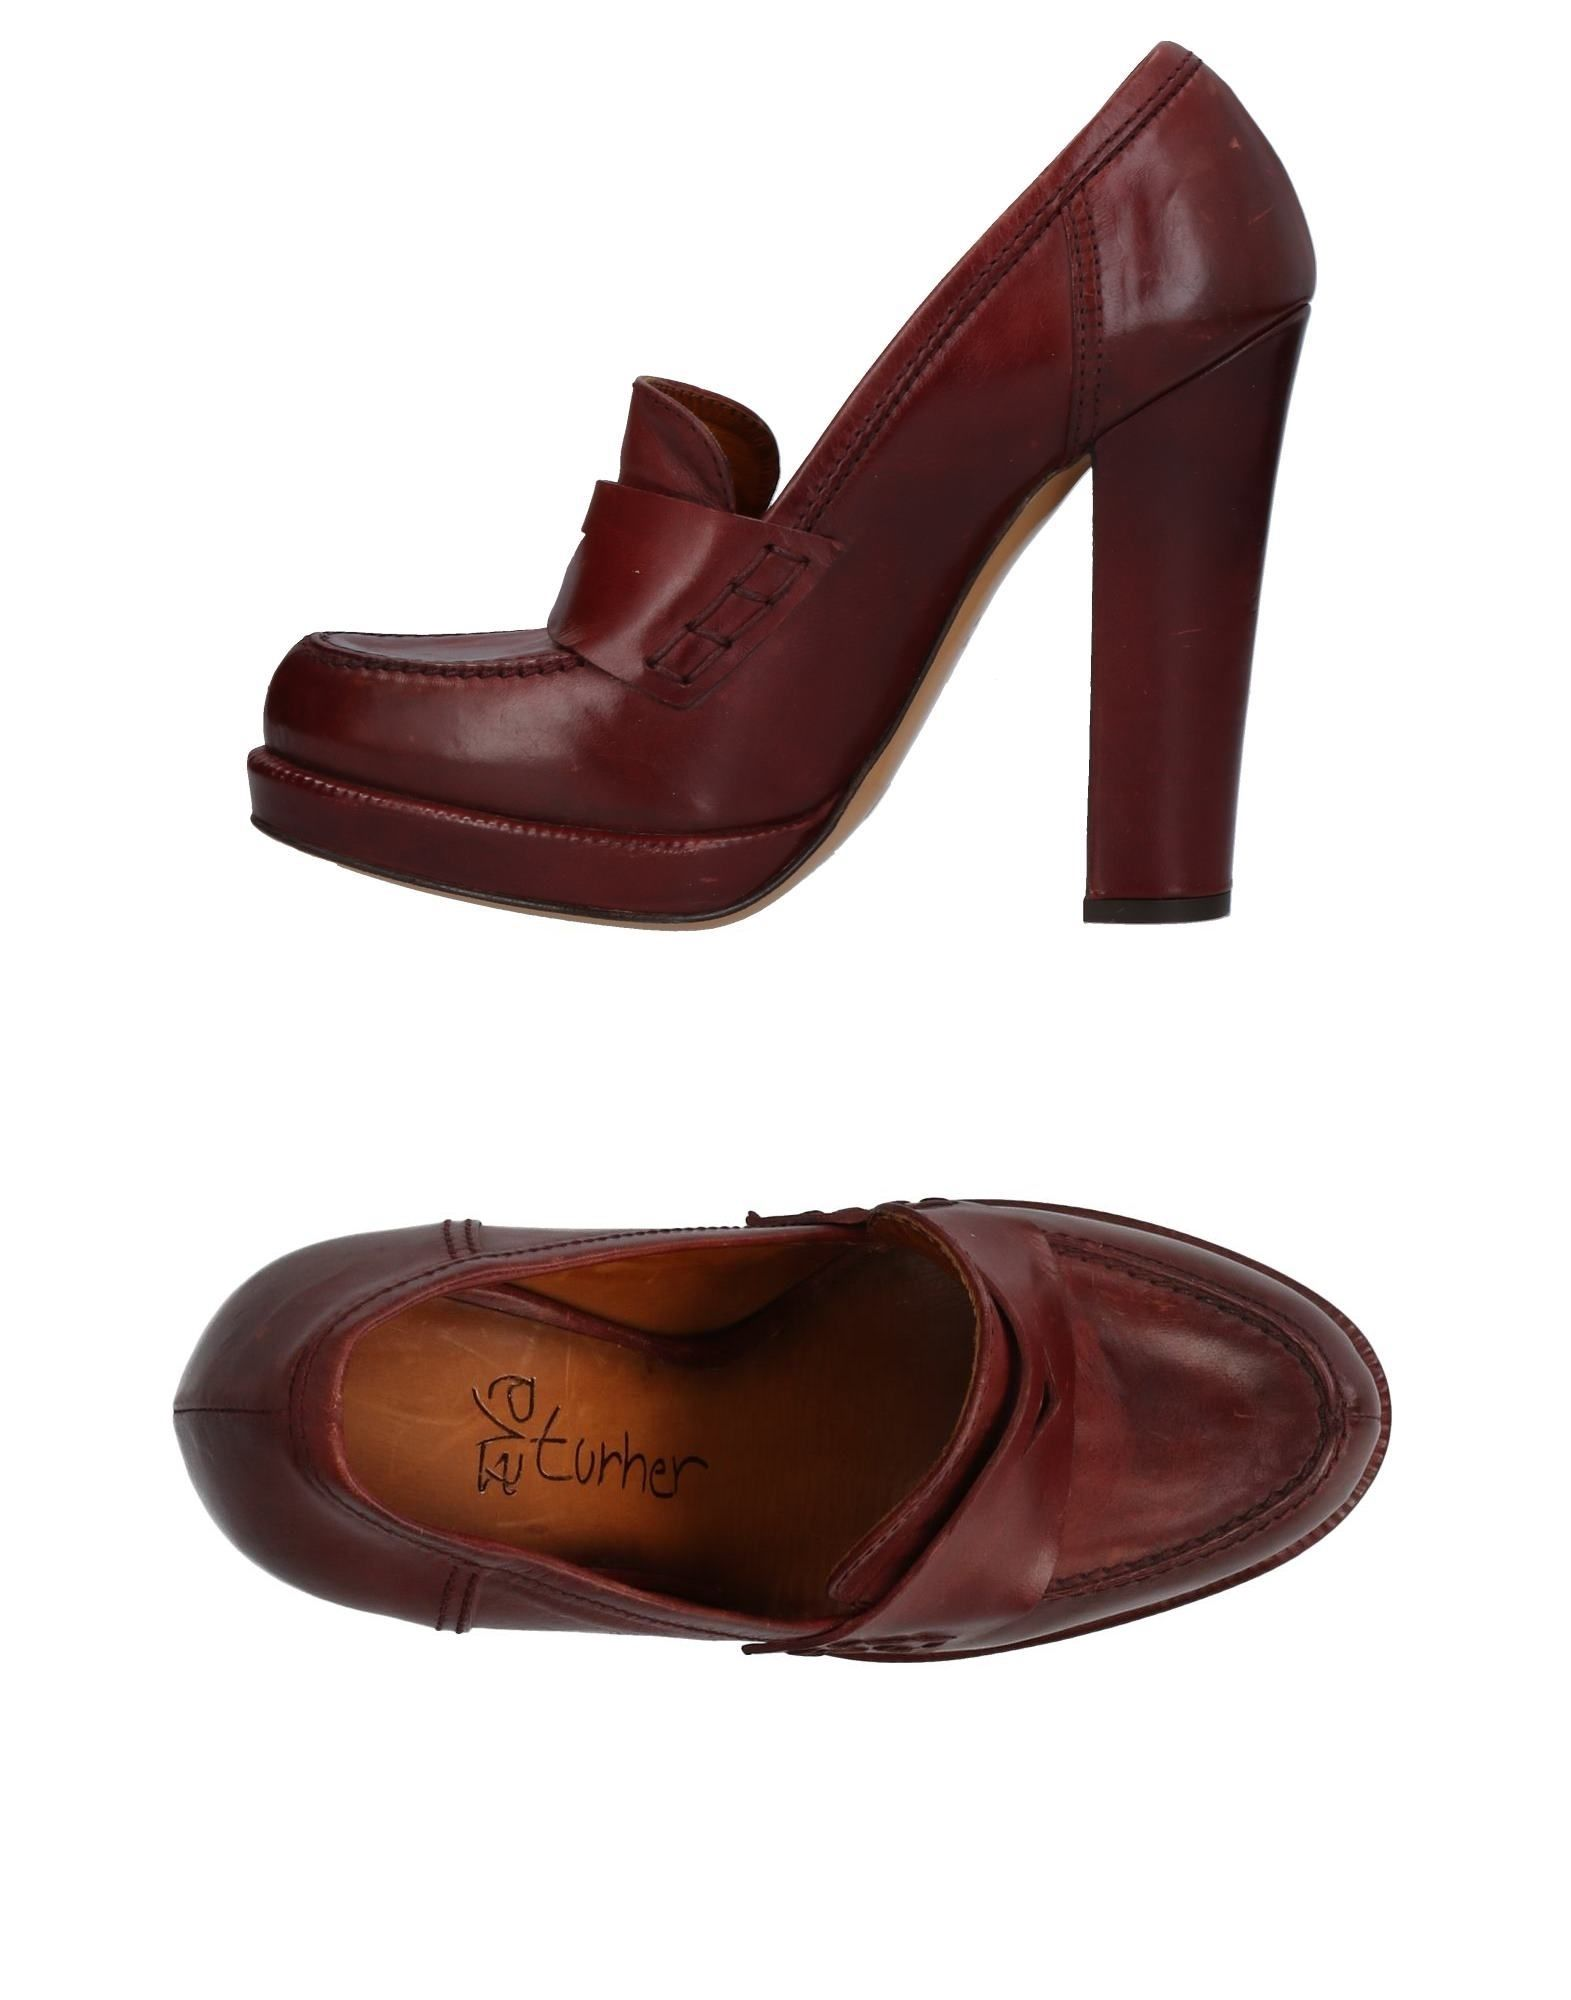 Eva Turner Mokassins Damen  11419791VV Gute Qualität beliebte Schuhe